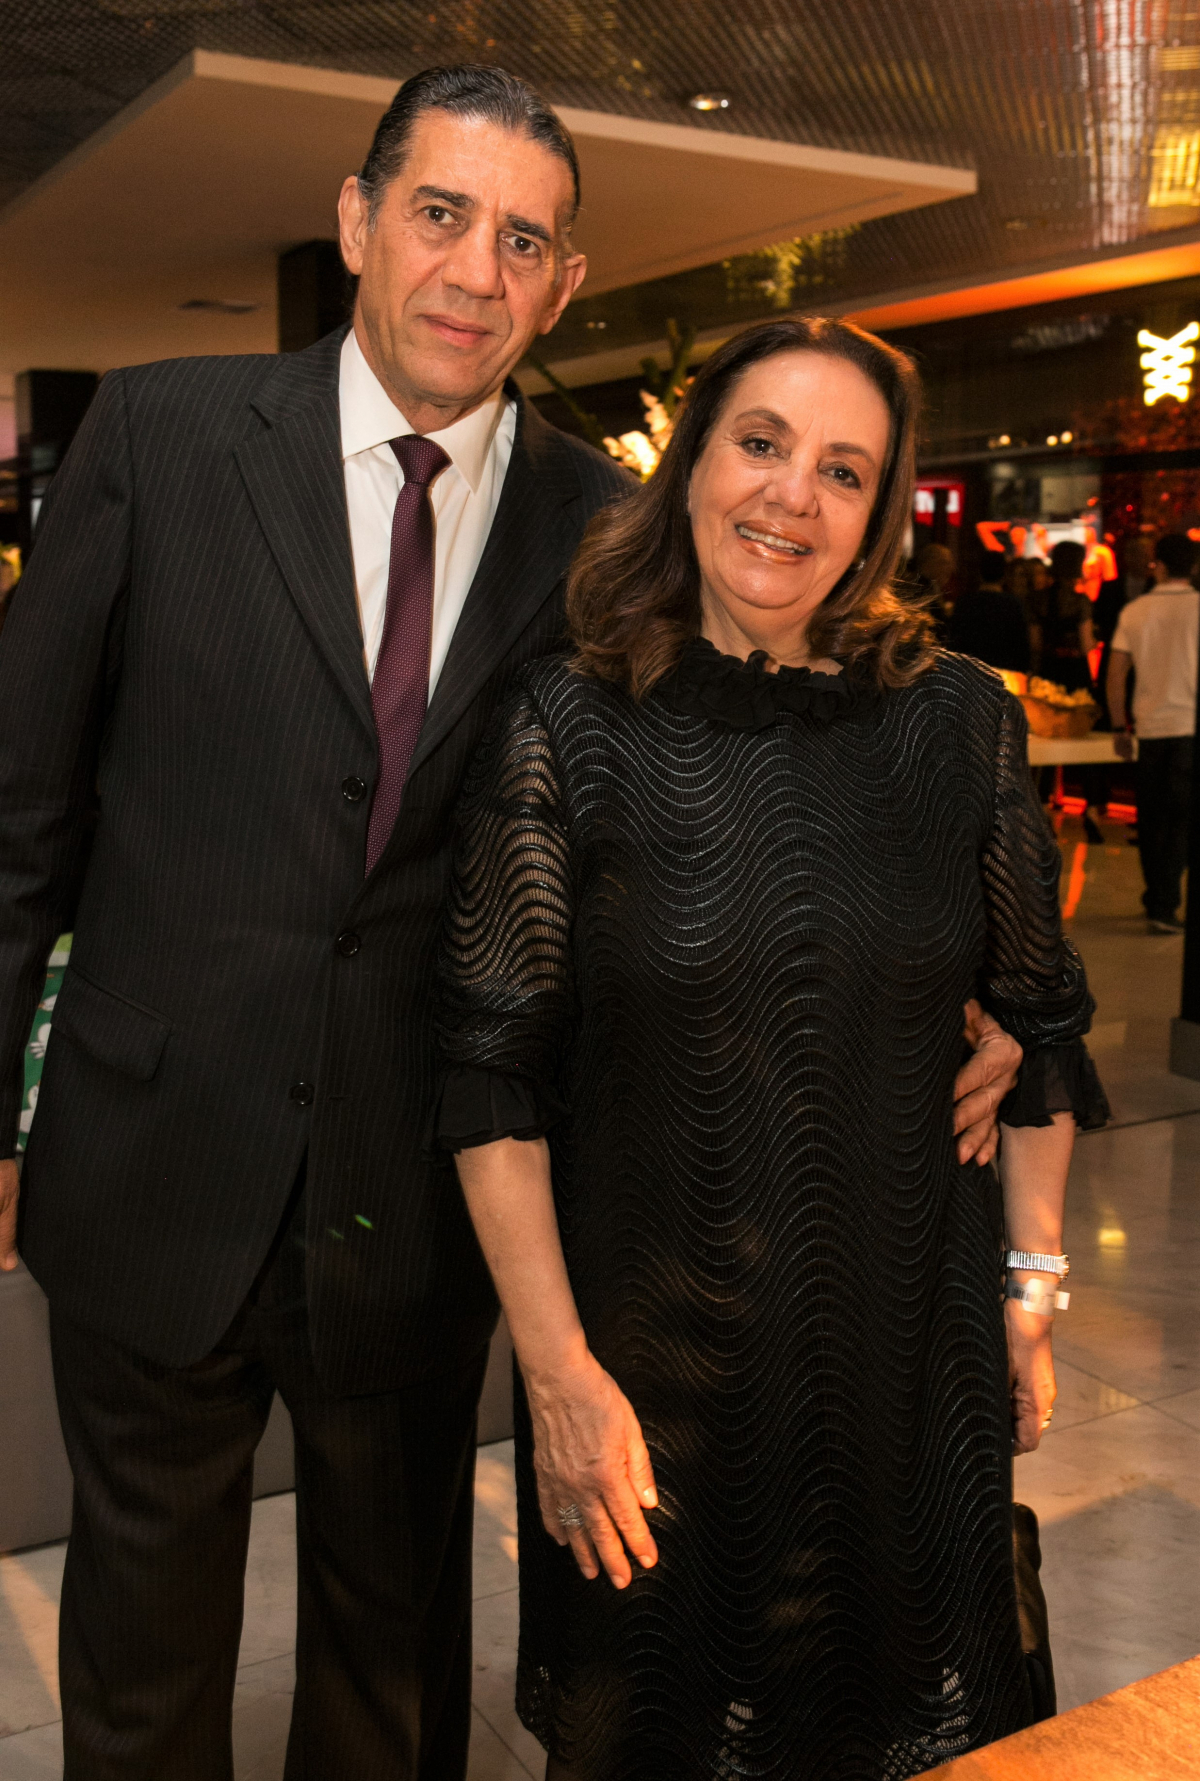 Syriaco Atherino Szpoganicz e Ana Tibau - RENATO GAMA/DIVULGAÇÃO/ND